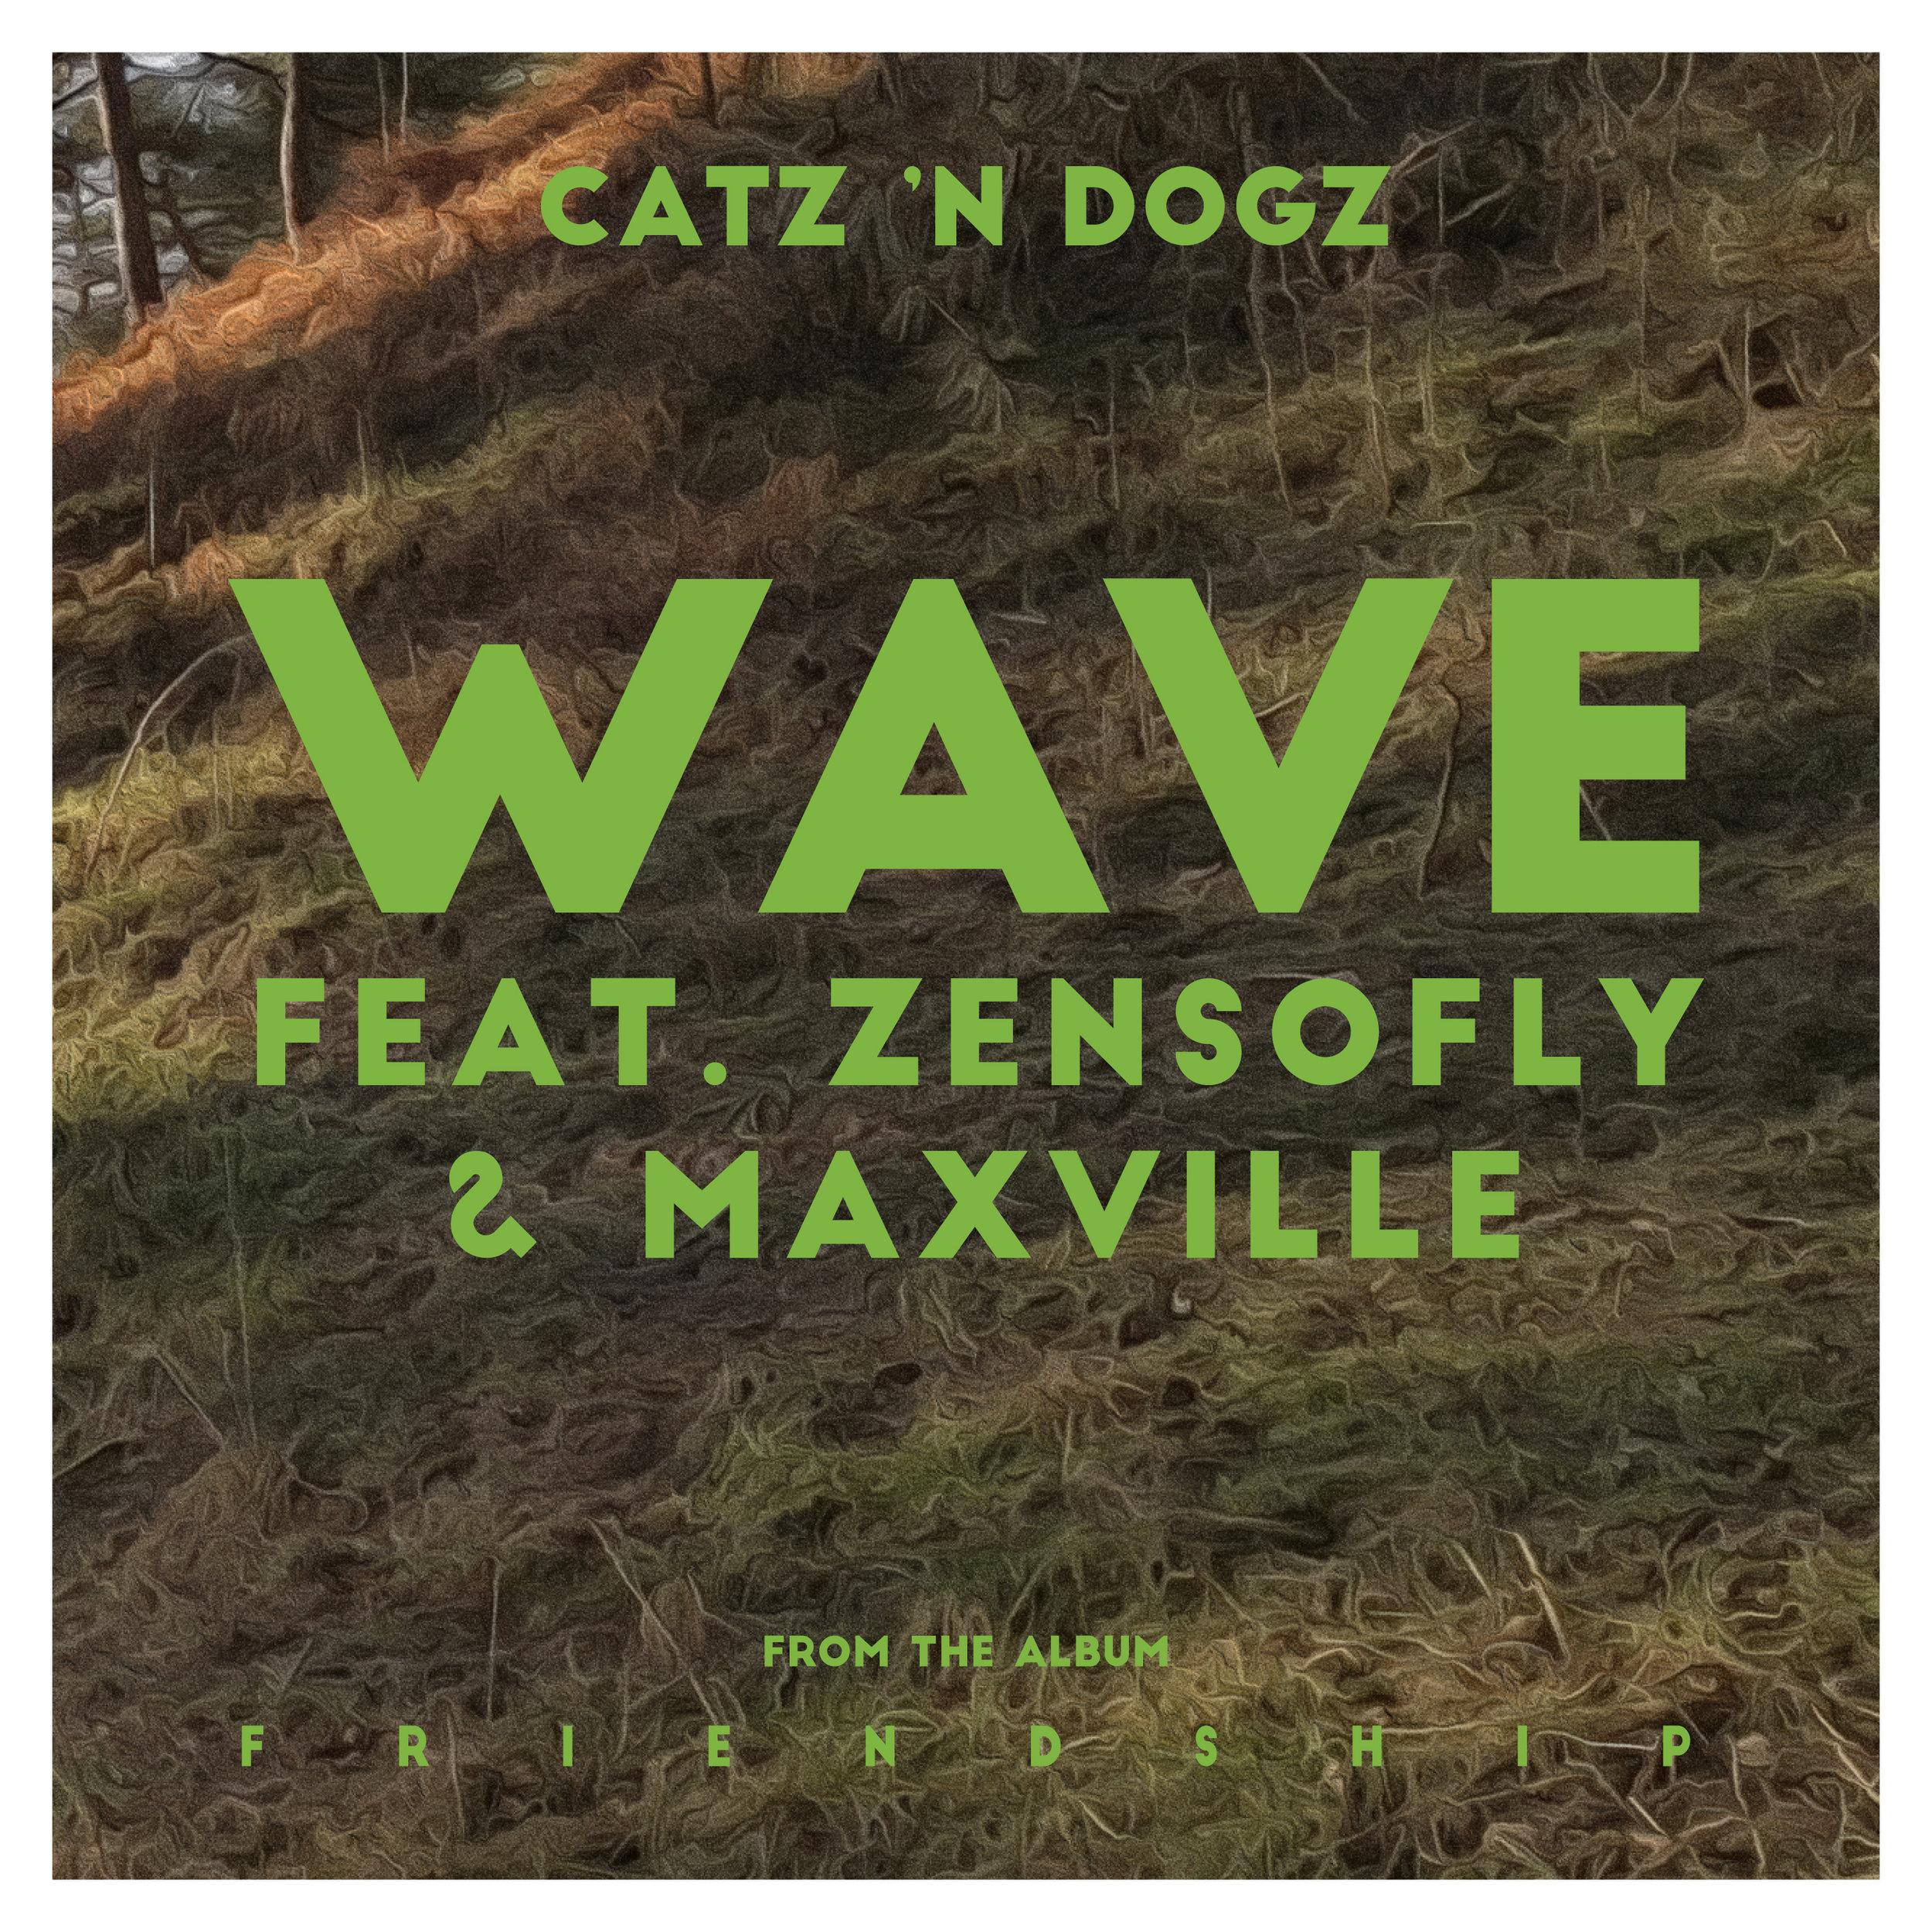 Catz 'n Dogz - Wave feat. Zensofly & Maxville EP [PETS104]